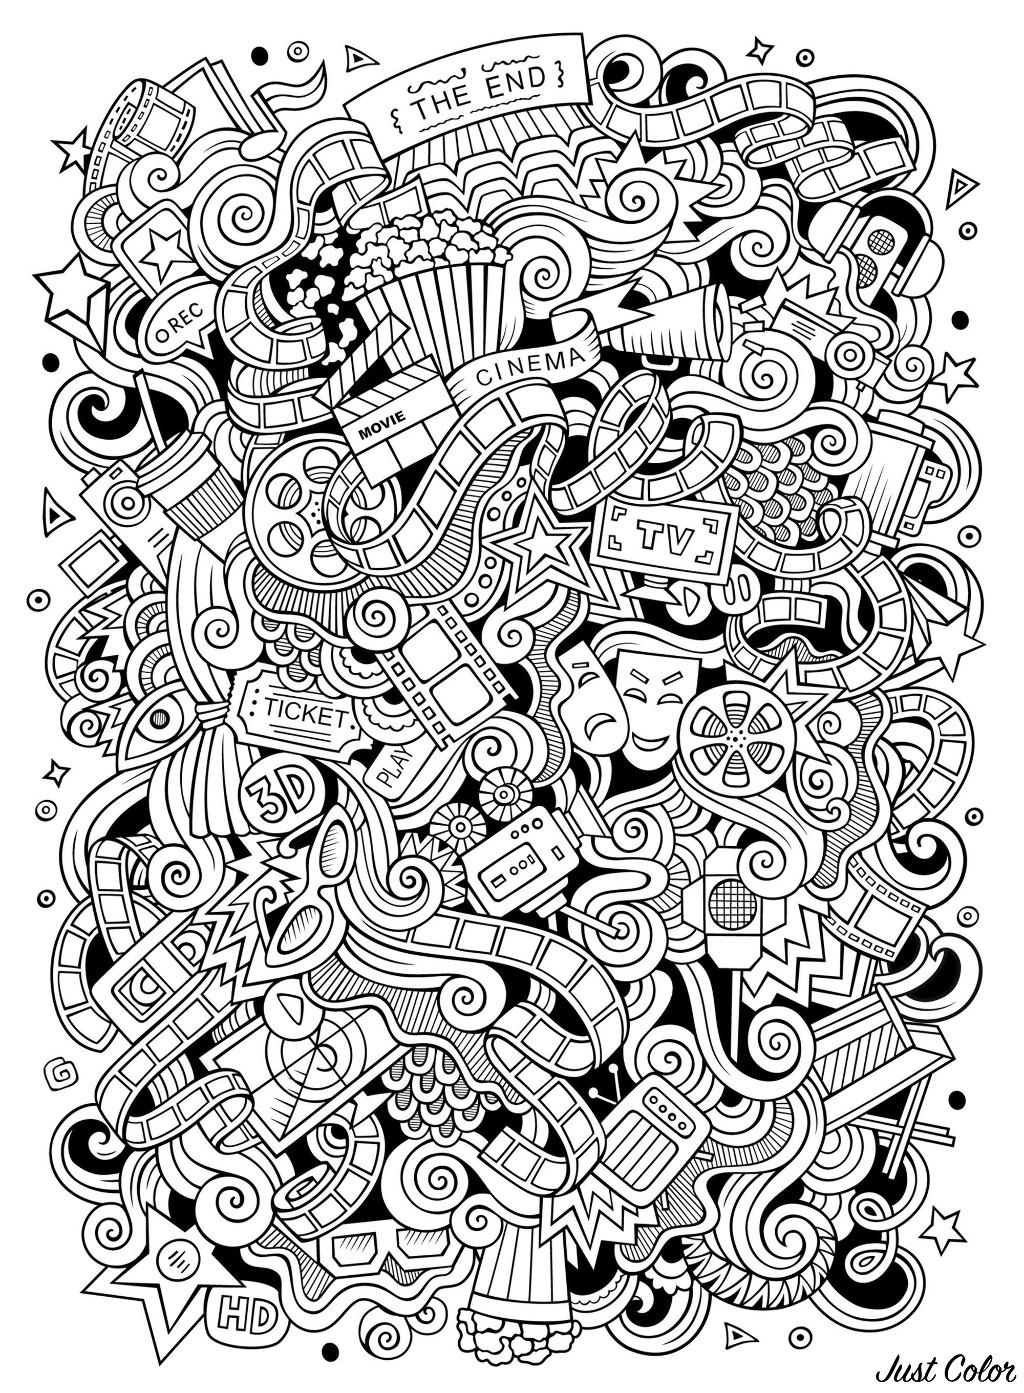 art pictures to color cinema doodle doodle art doodling adult coloring pages to color art pictures